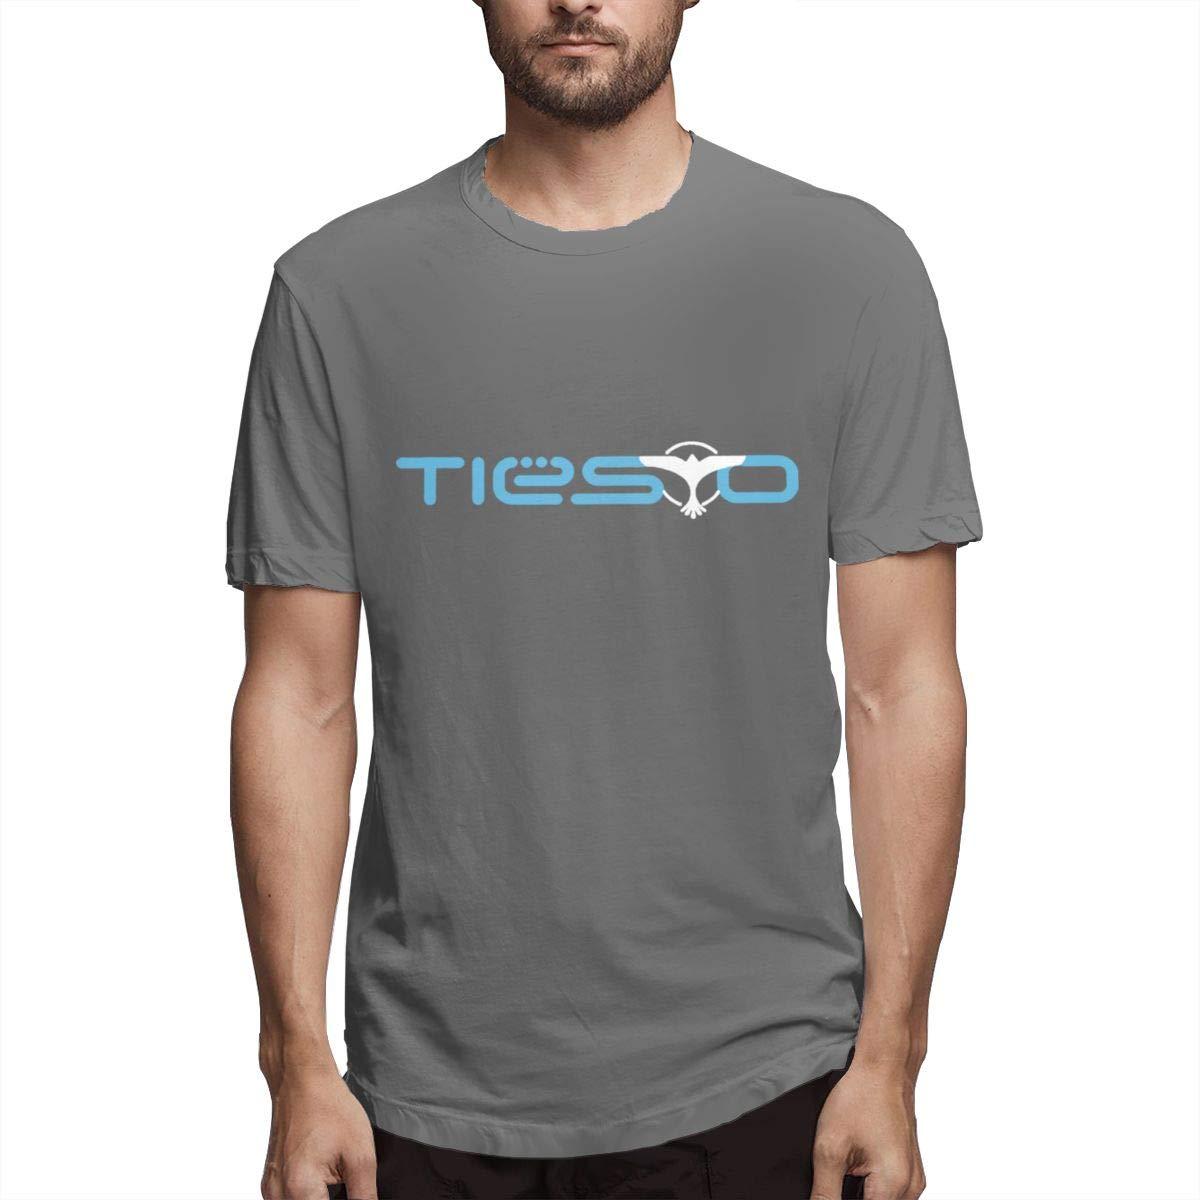 Seuriamin Tiesto S Funny Gym Short Sleeve T Shirt